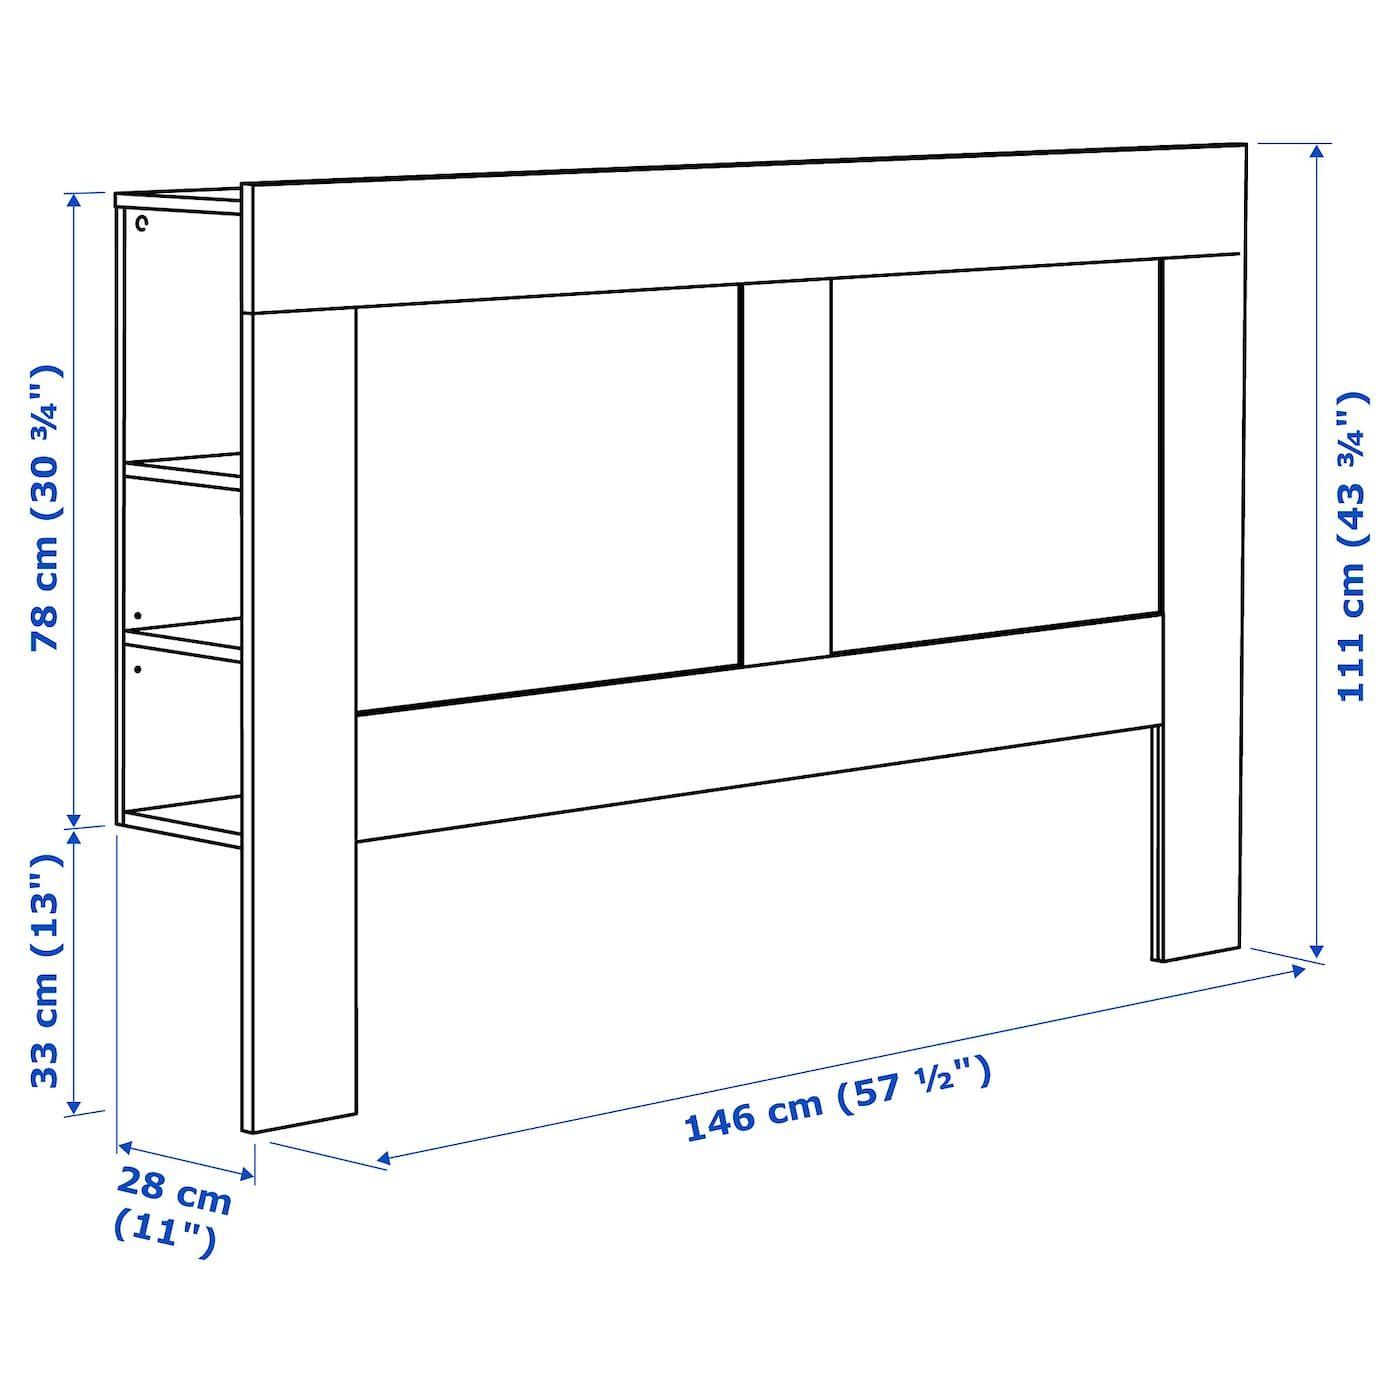 Brimnes Tete De Lit Avec Rangement Blanc 140 Cm Ikea In 2020 Kopfteil Regale Ikea Kopfteil